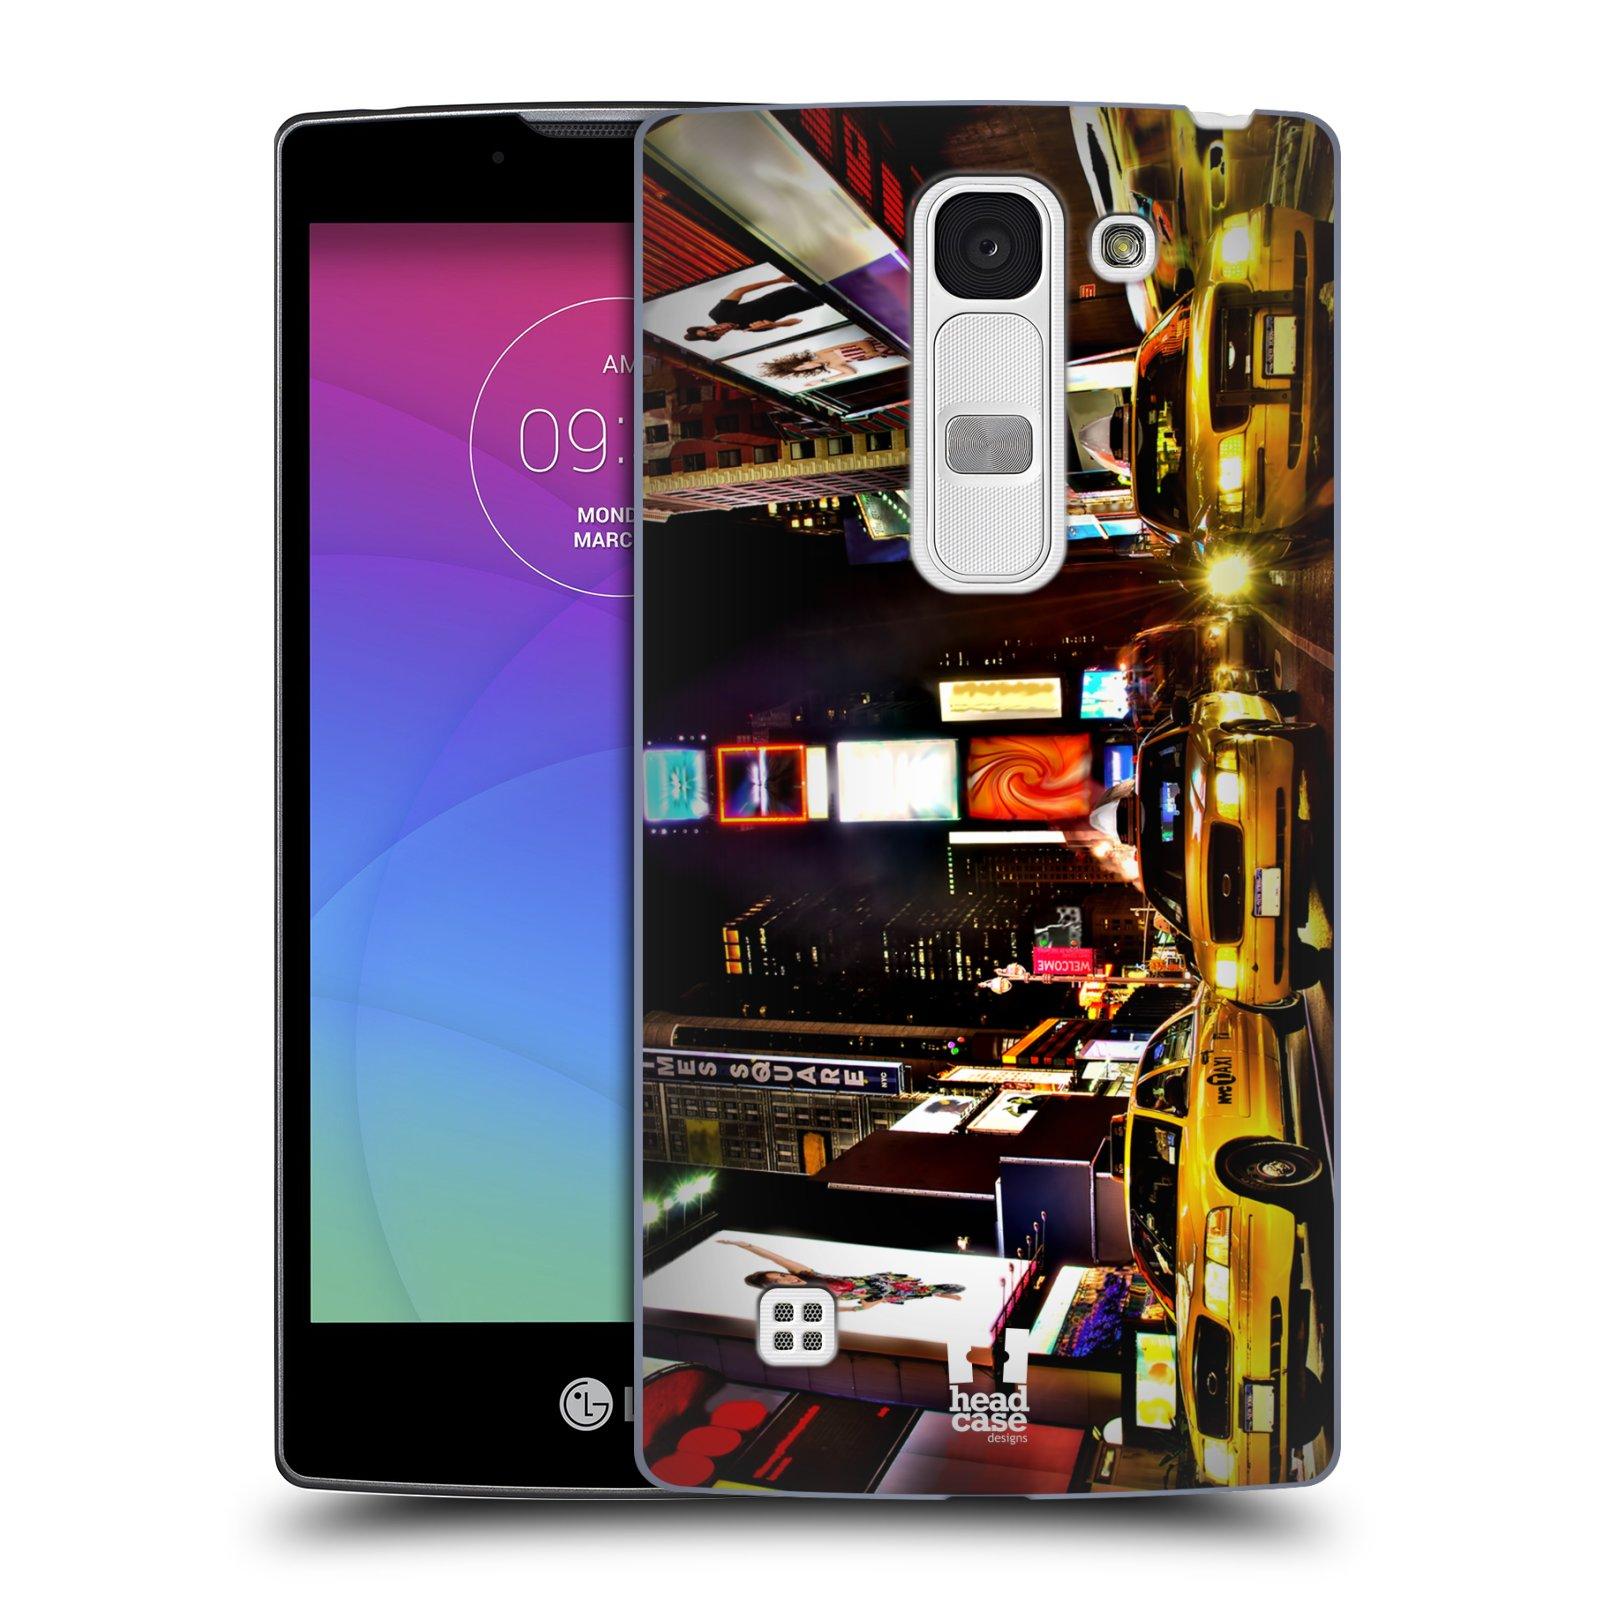 Plastové pouzdro na mobil LG Spirit LTE HEAD CASE NEW YORK TIMES SQUARE (Kryt či obal na mobilní telefon LG Spirit H420 a LG Spirit LTE H440N)